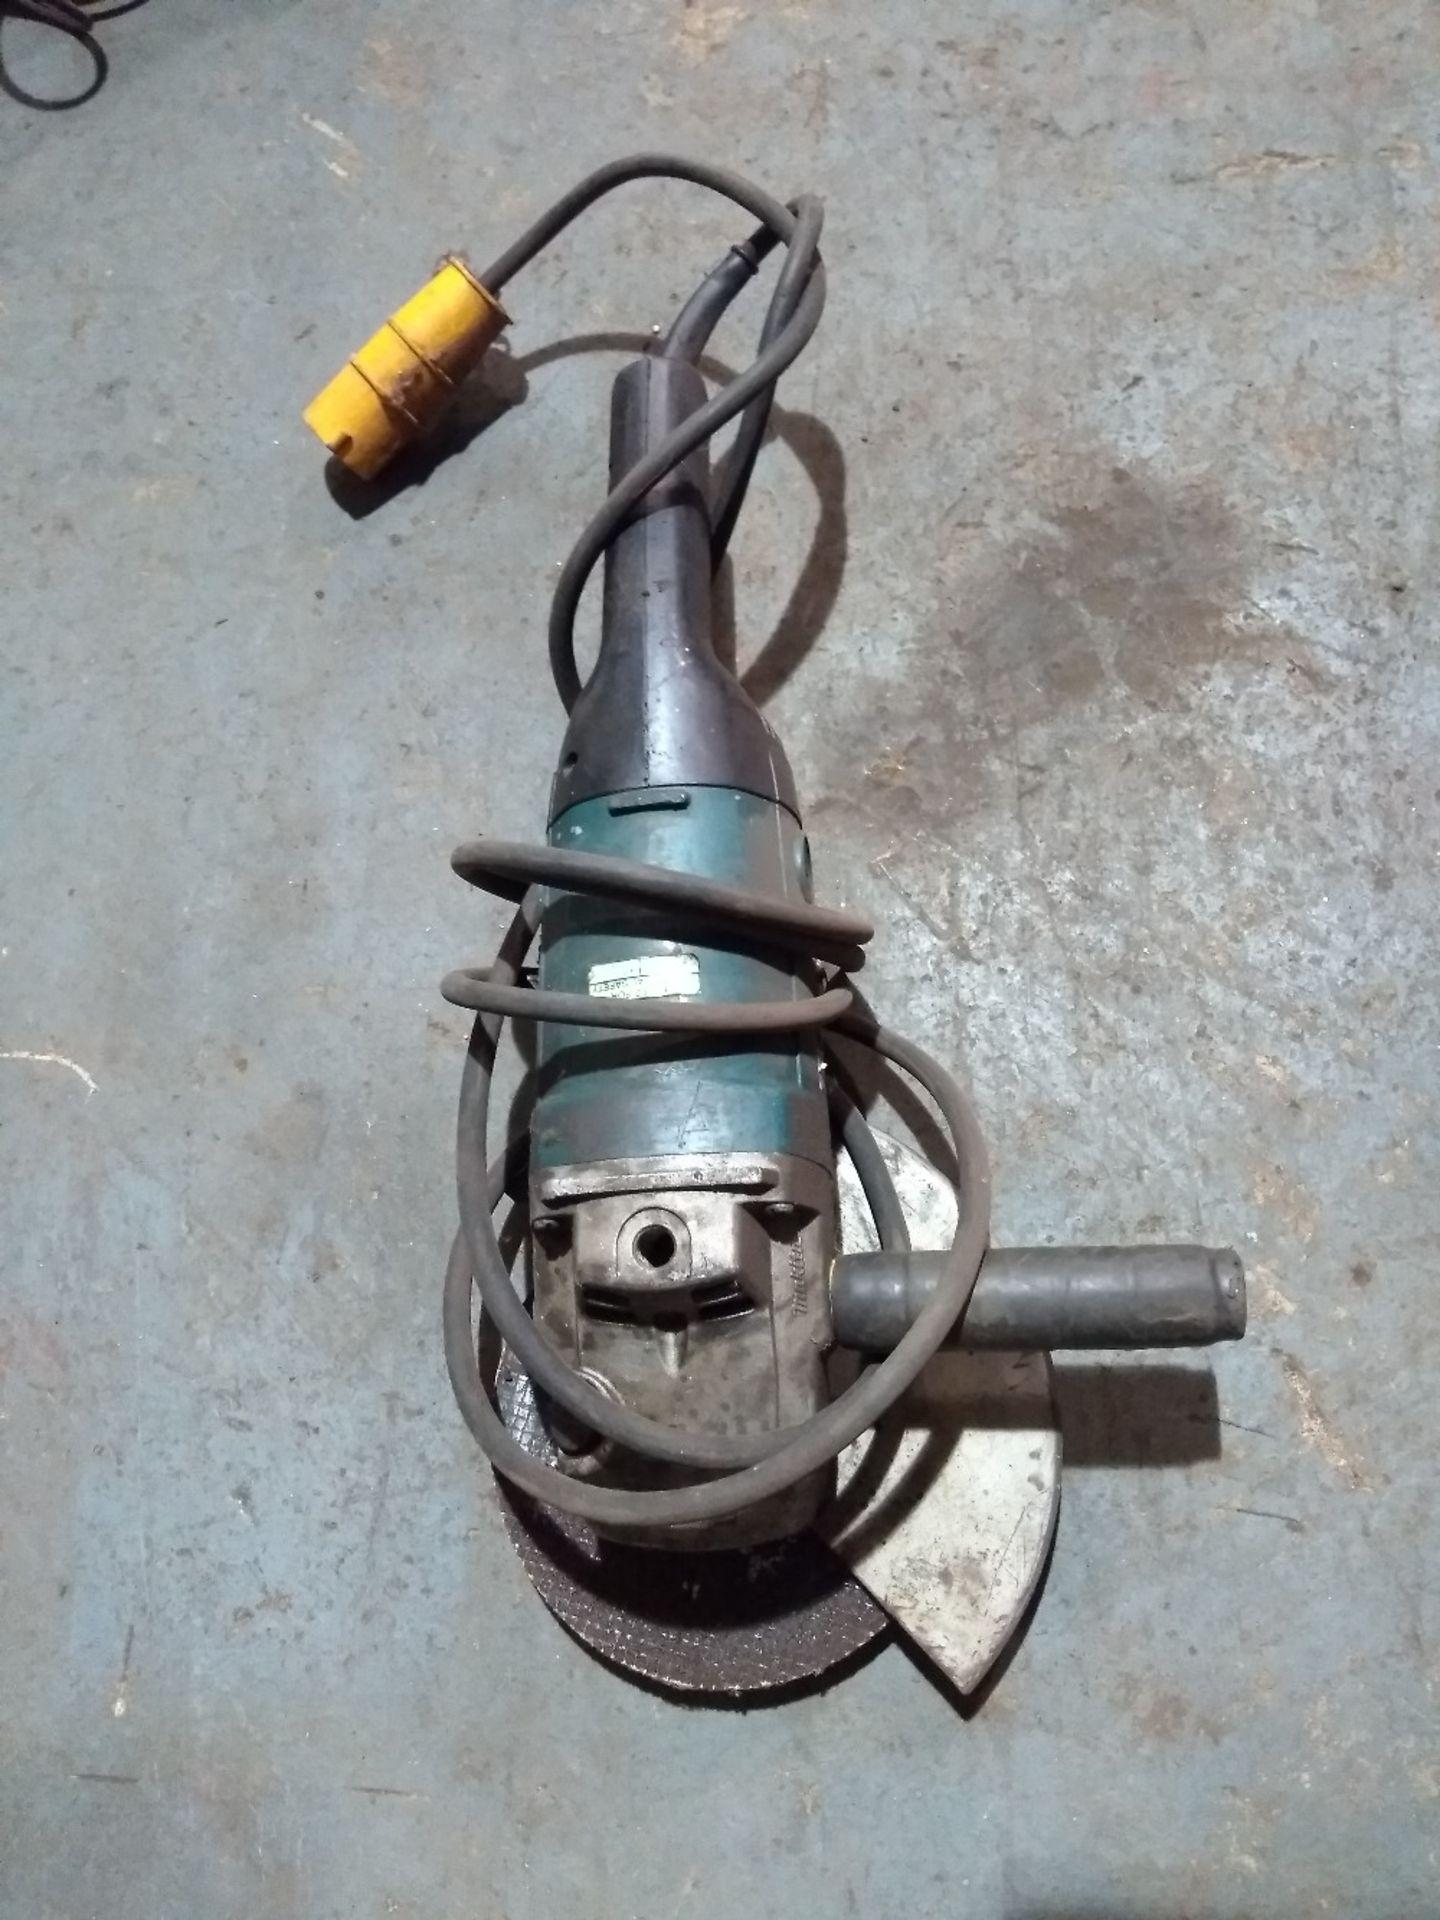 Lot 30 - Makita 230mm 90698 110V grinder/ disc cutter. Electrical Safety Test Passed (2.8.19).